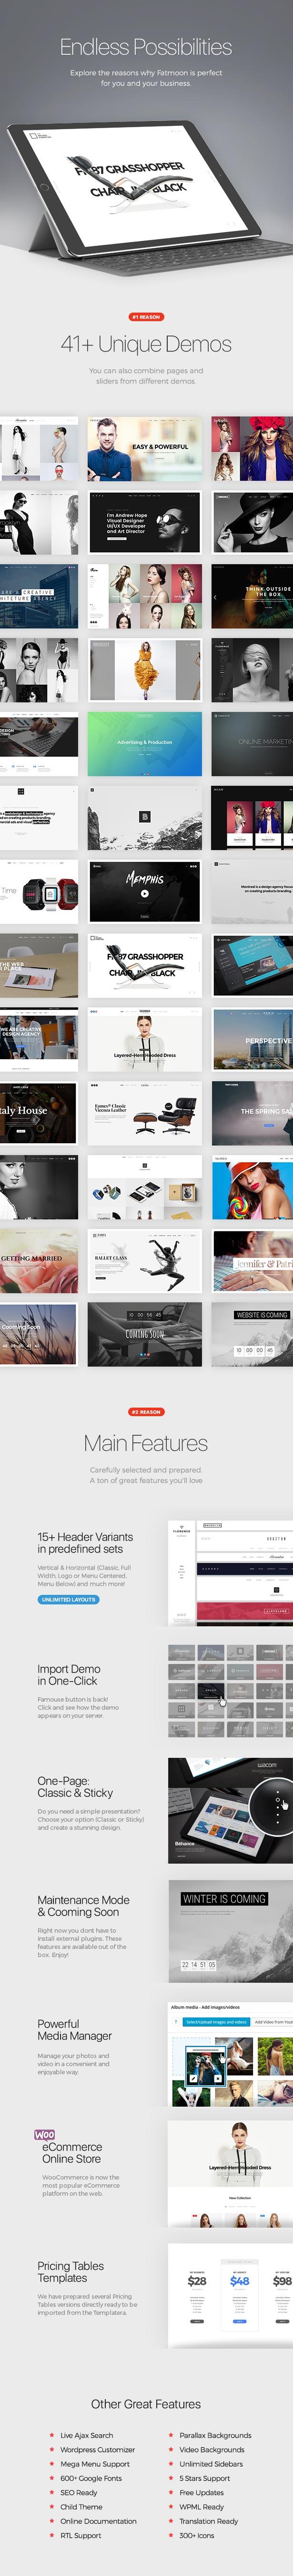 FatMoon | Creative & Photography Multi-Purpose Theme - 2